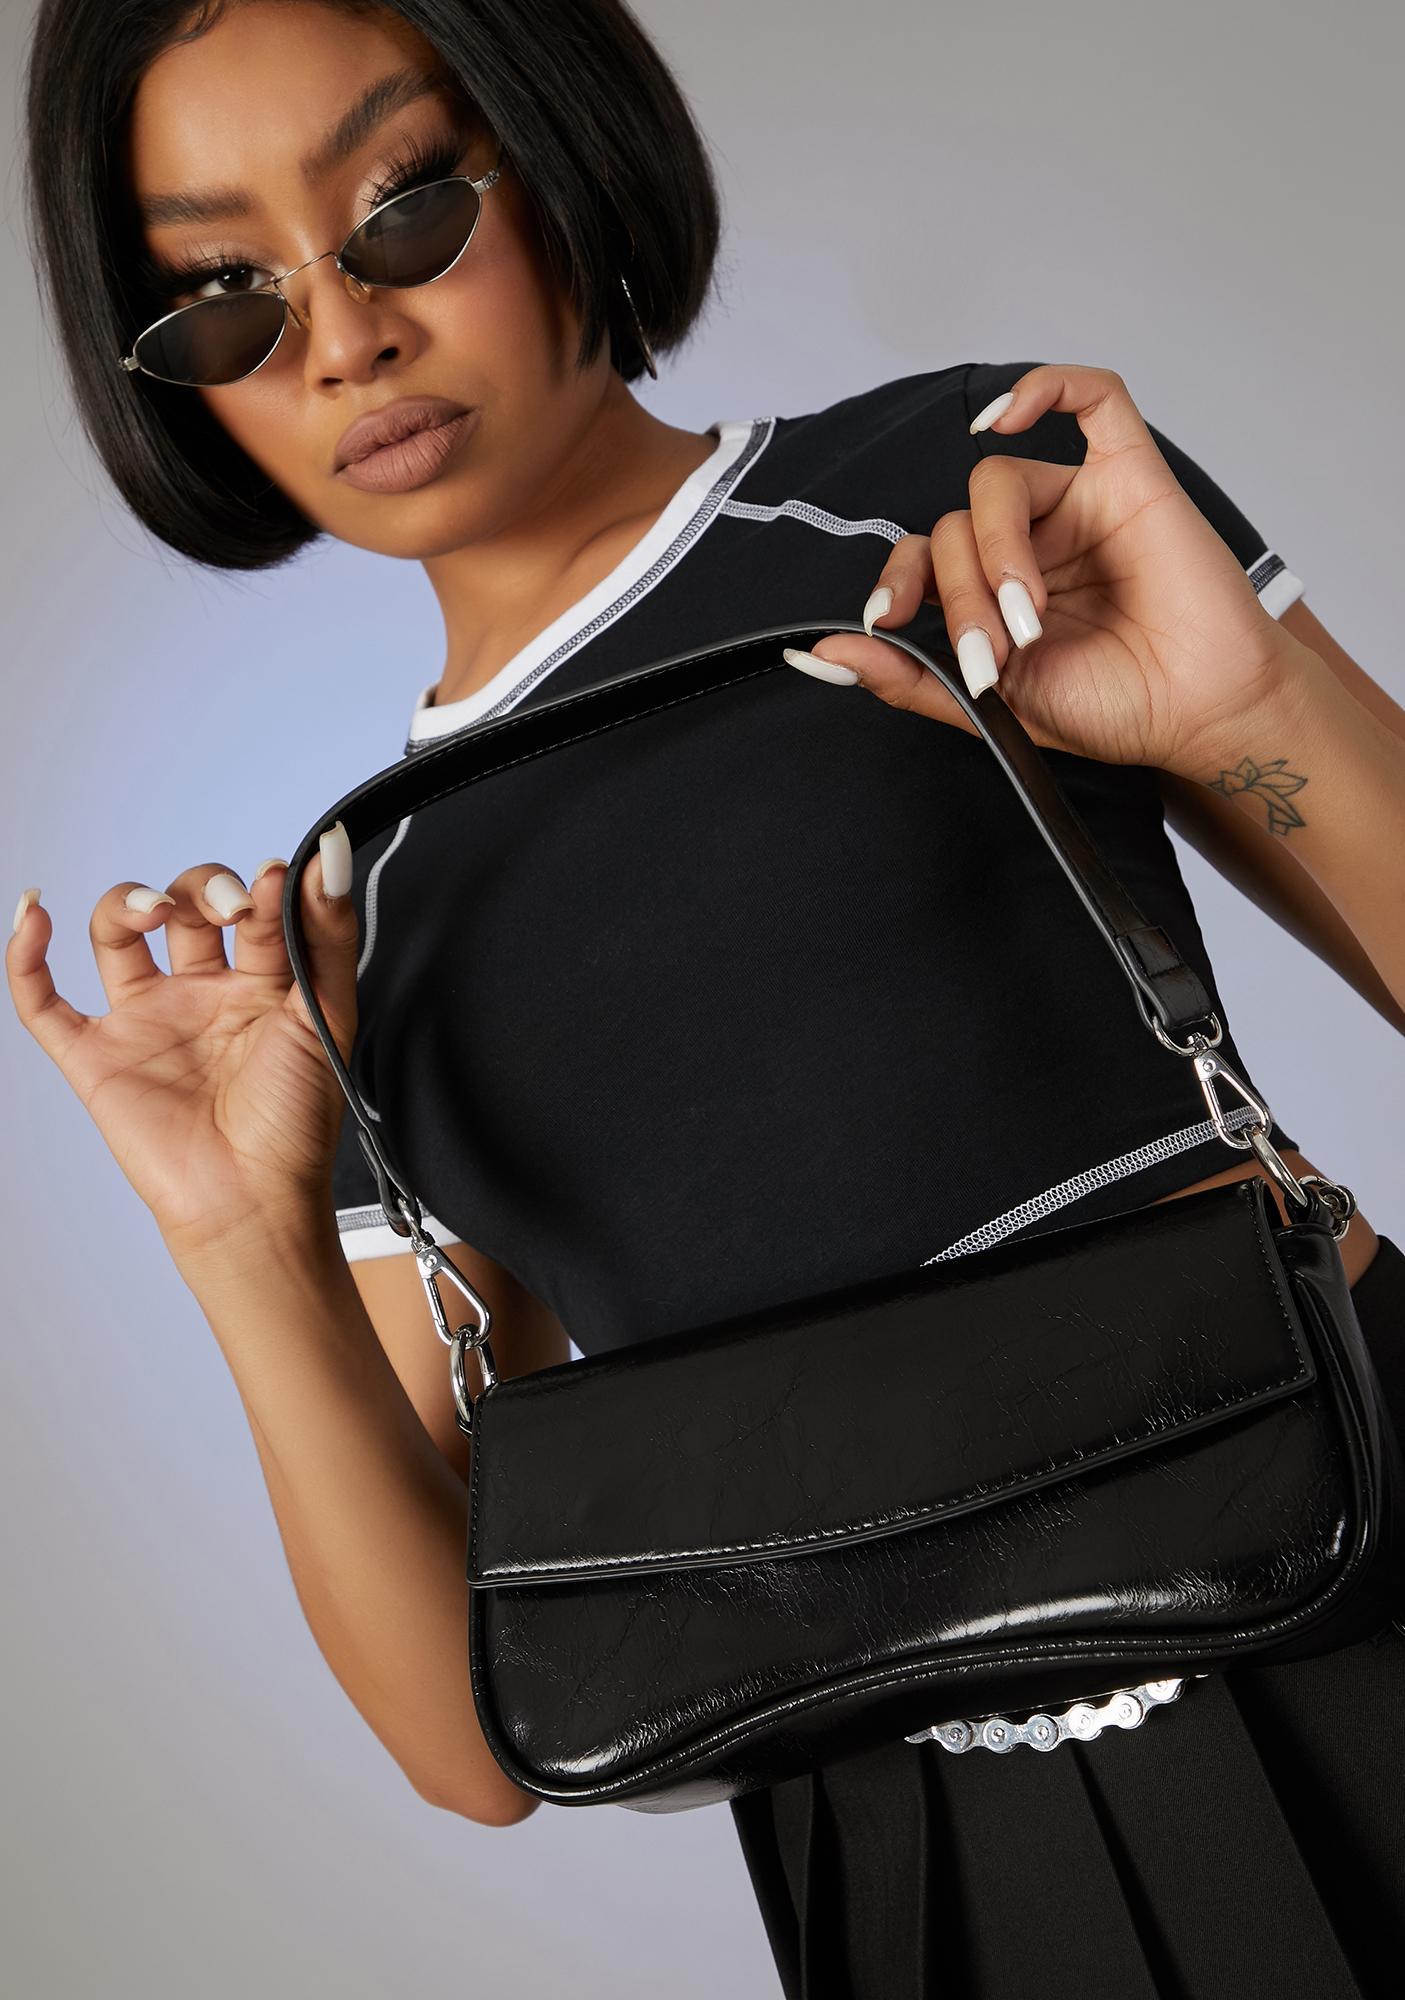 Poster Grl Two Faced Chain Shoulder Bag